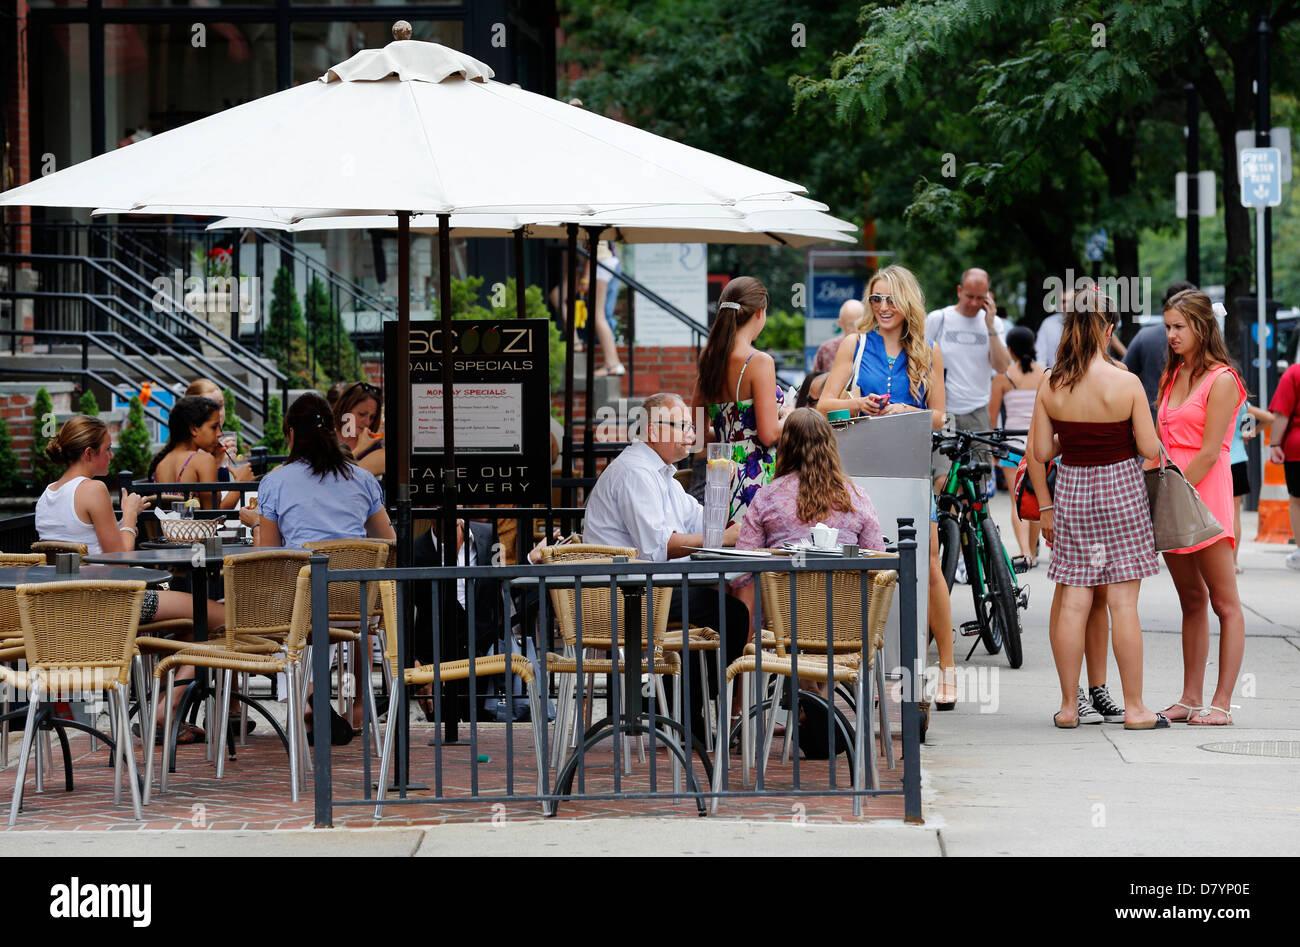 Sidewalk cafe, Newbury Street, Boston, Massachusetts - Stock Image